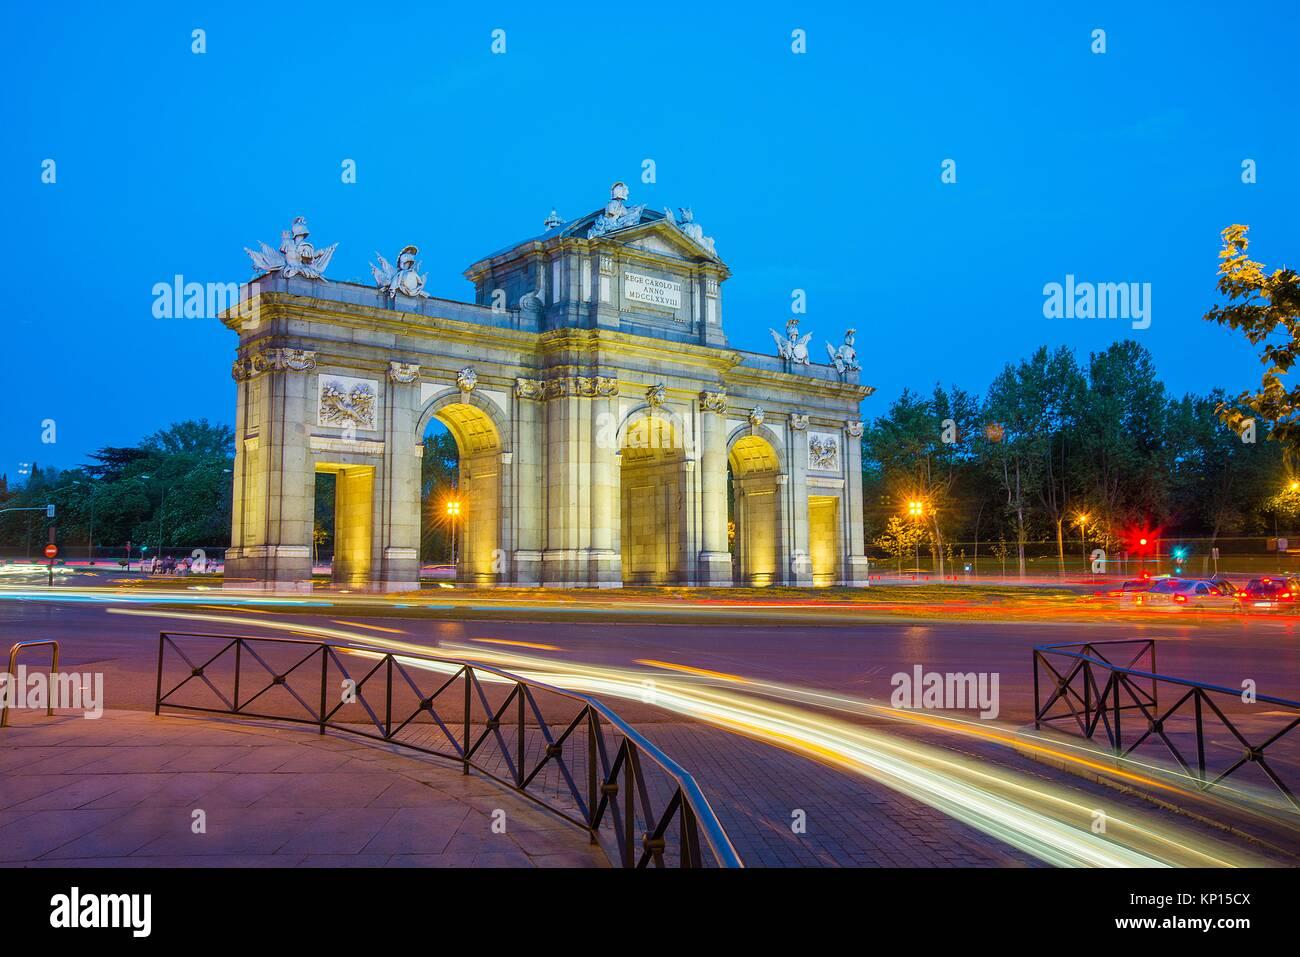 Alcala Gate, night view. Madrid, Spain. Stock Photo